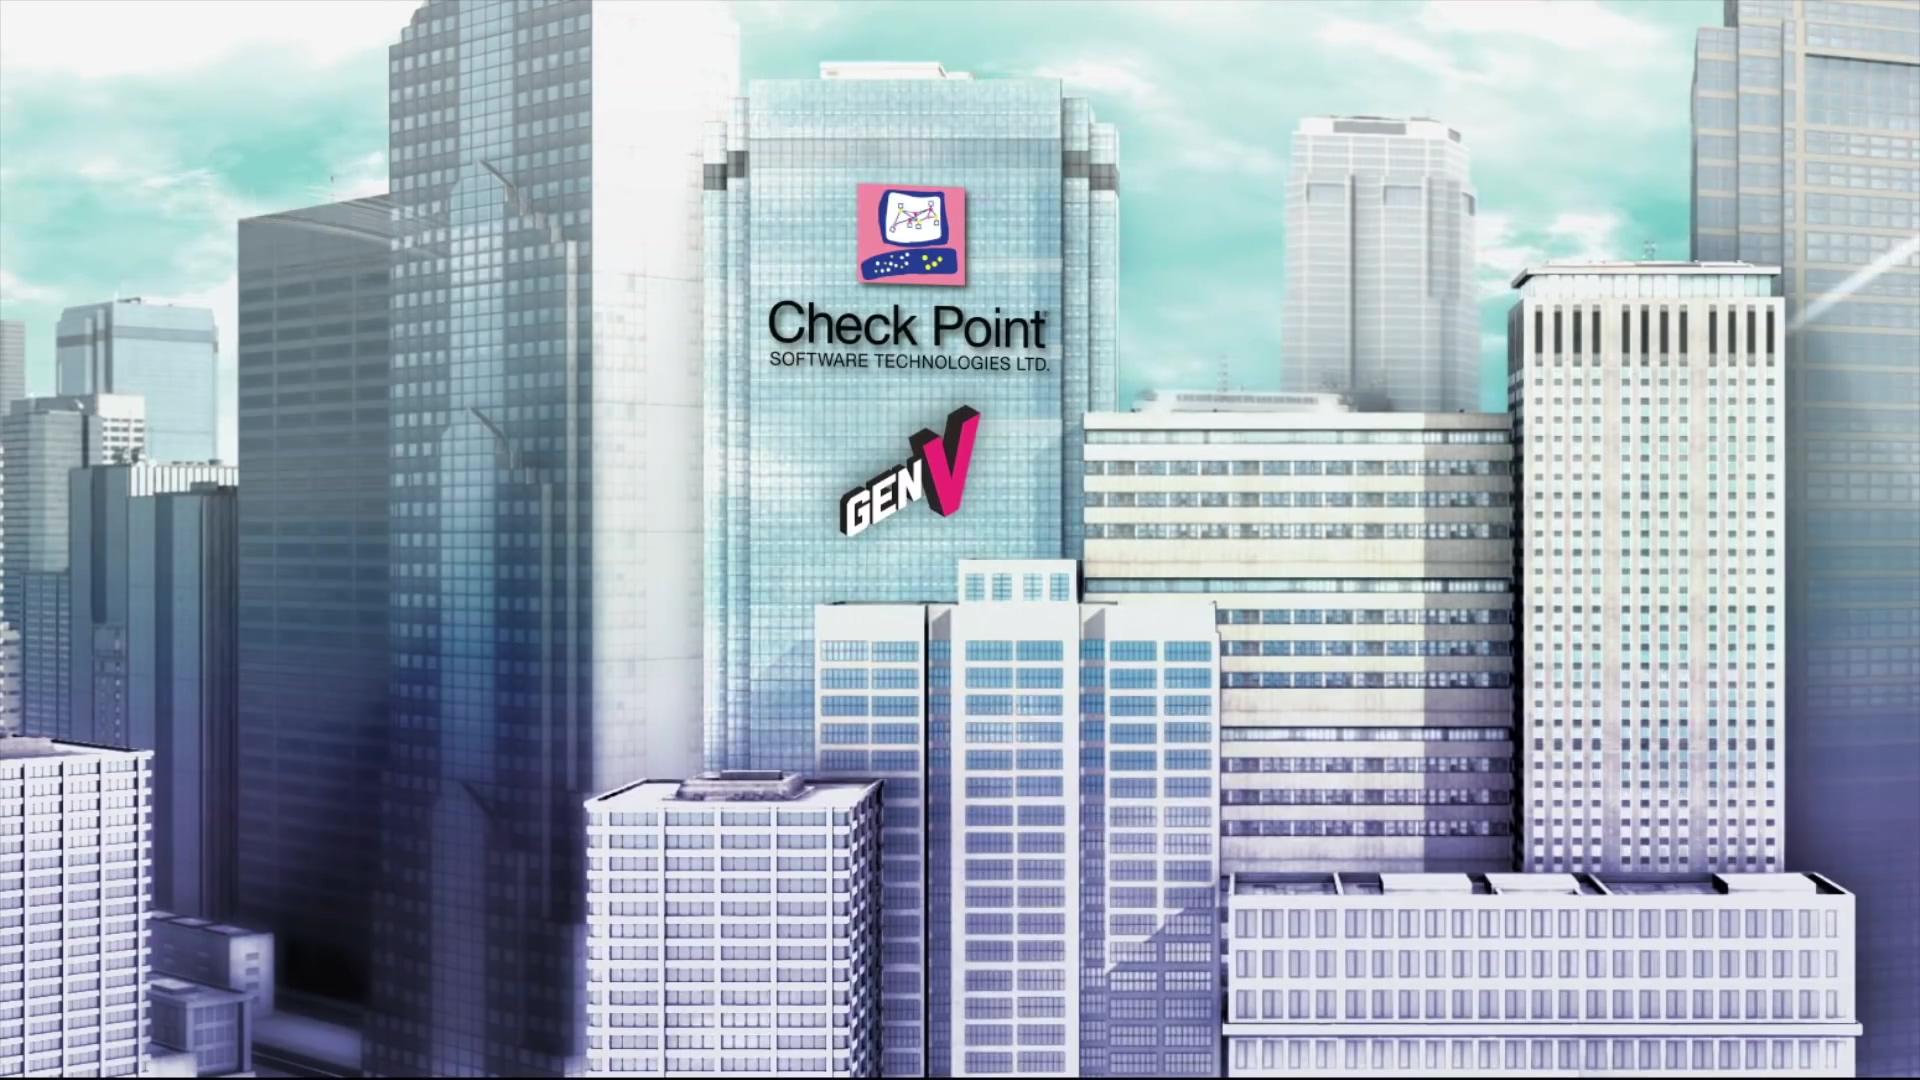 y2mate.com - Check Point Prevents 5th Generation Cyber Attacks_oKSacoiDAj0_1080p